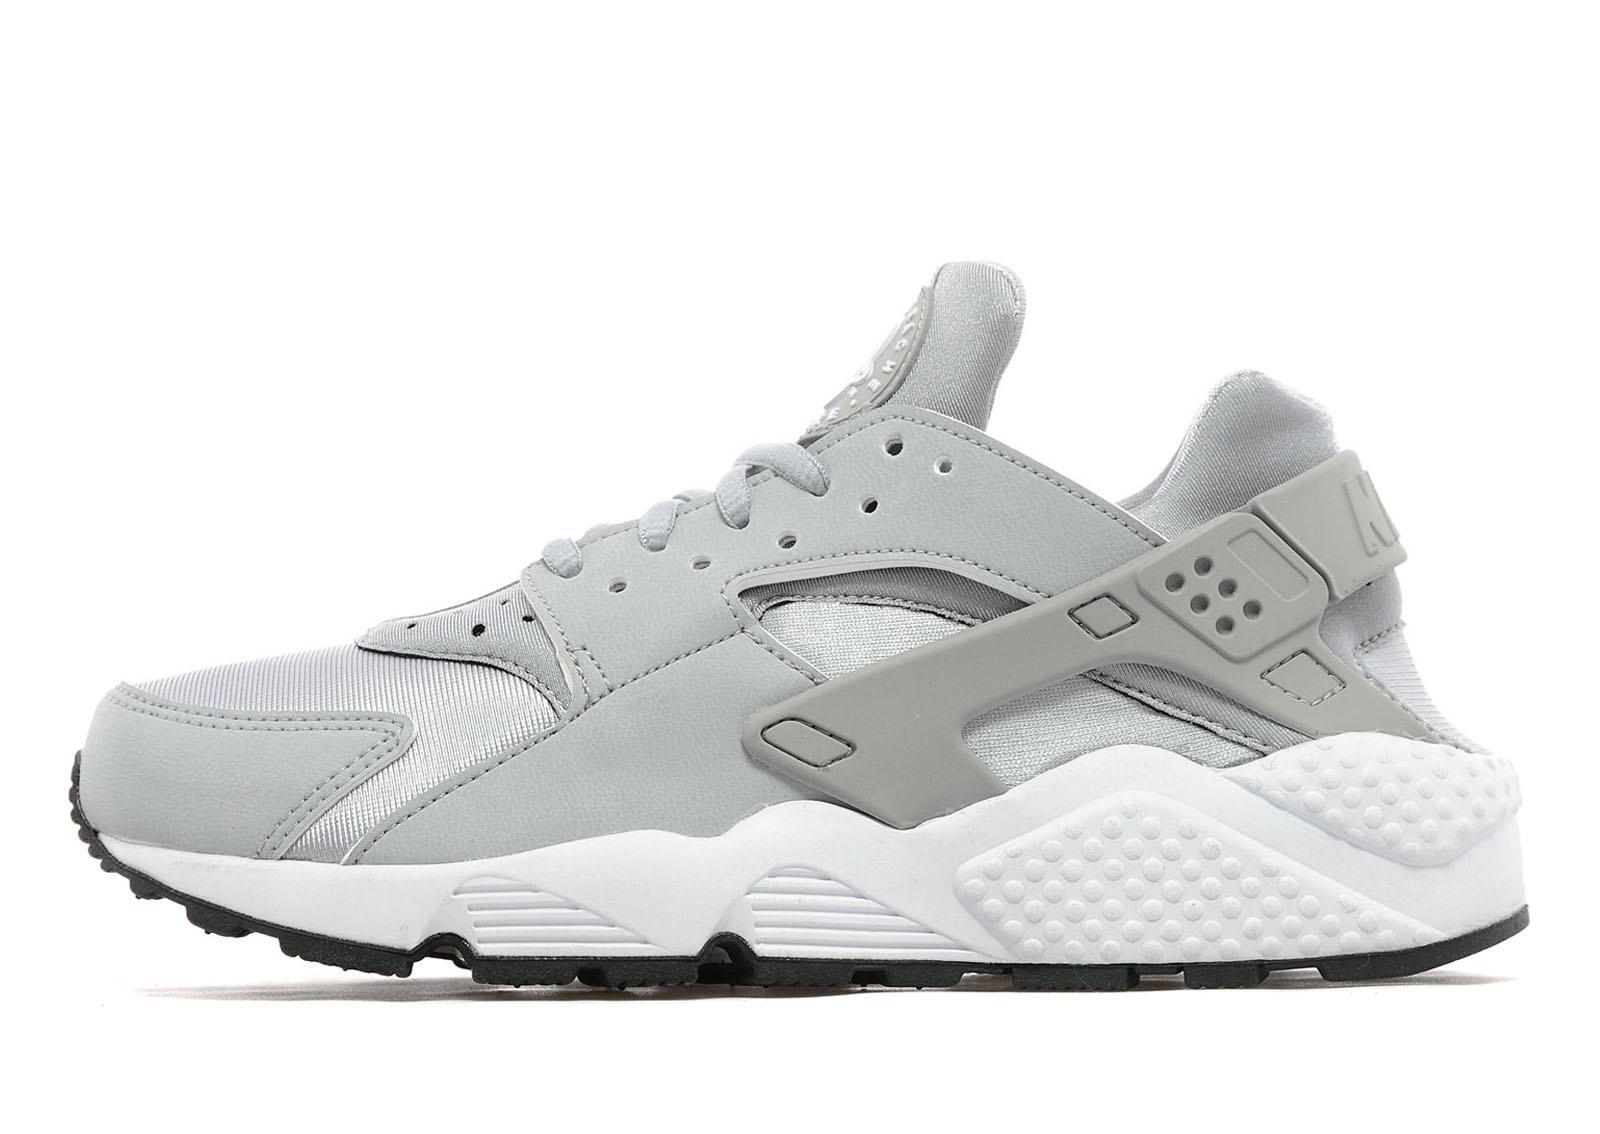 Nike Huarache Groen Dames